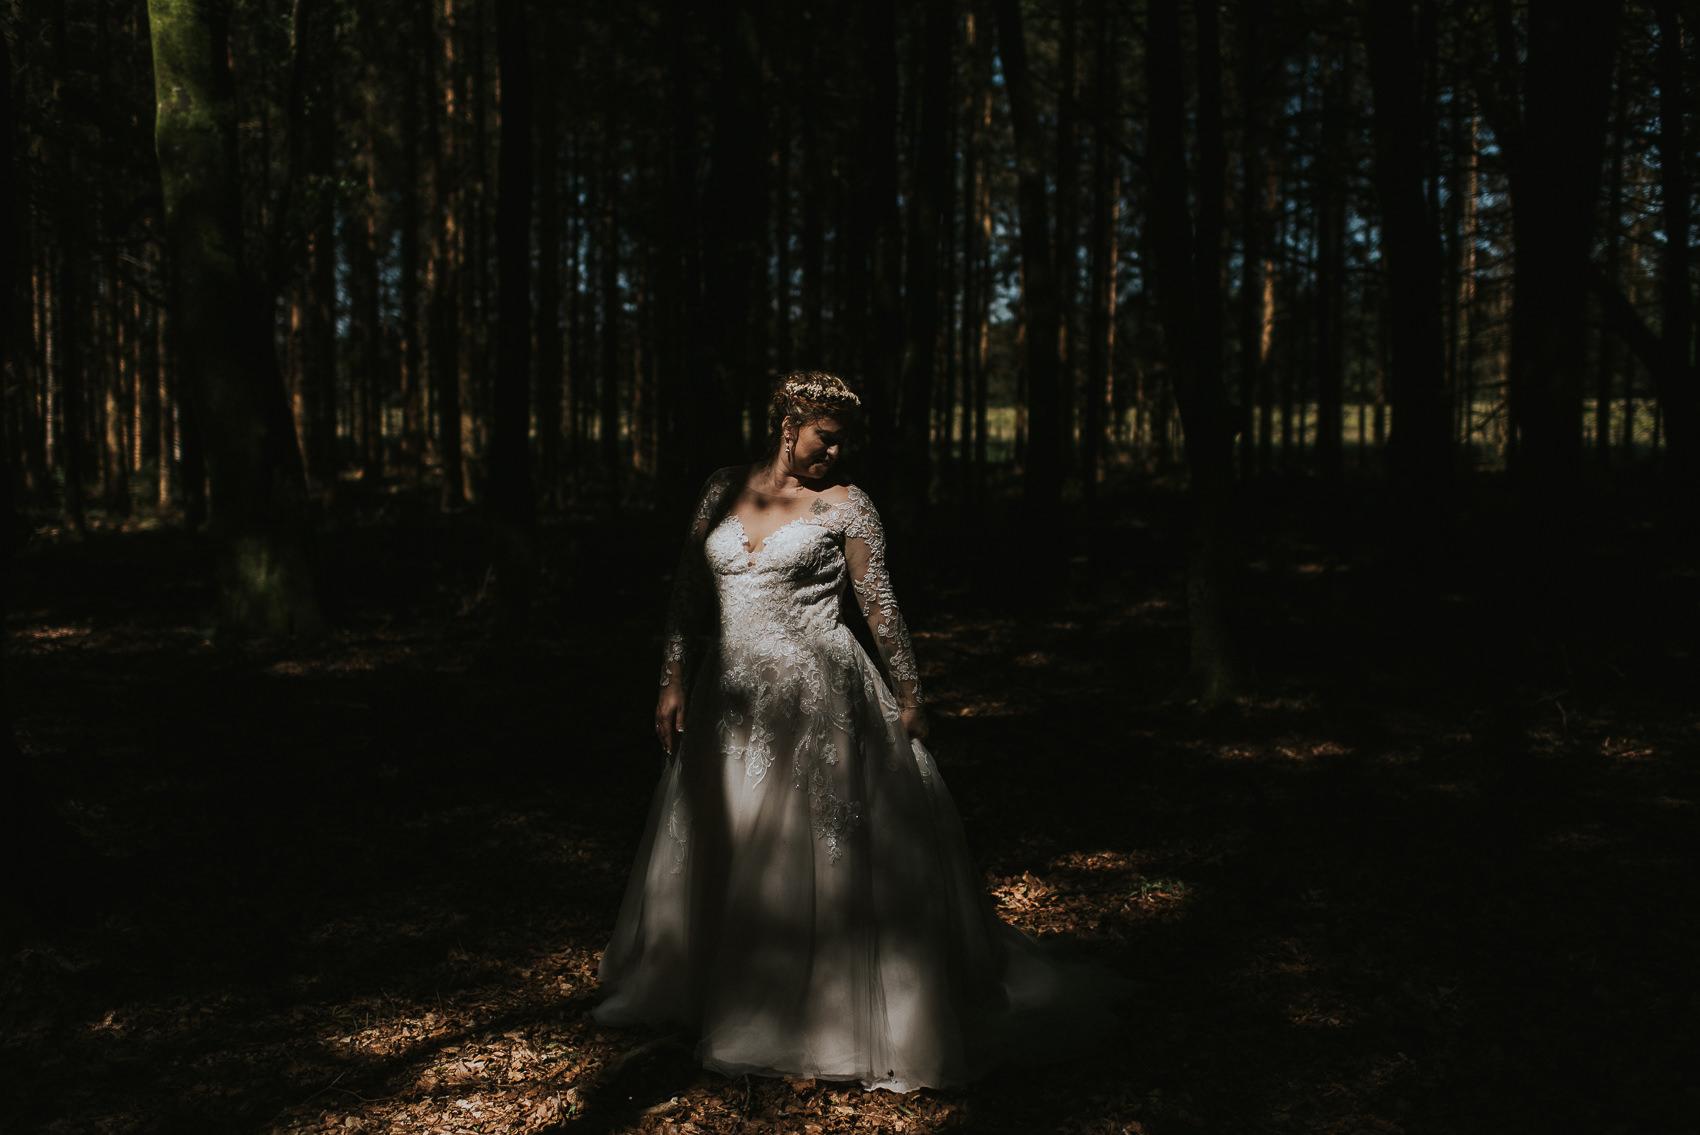 Photography by Ciara - wedding photographer 7